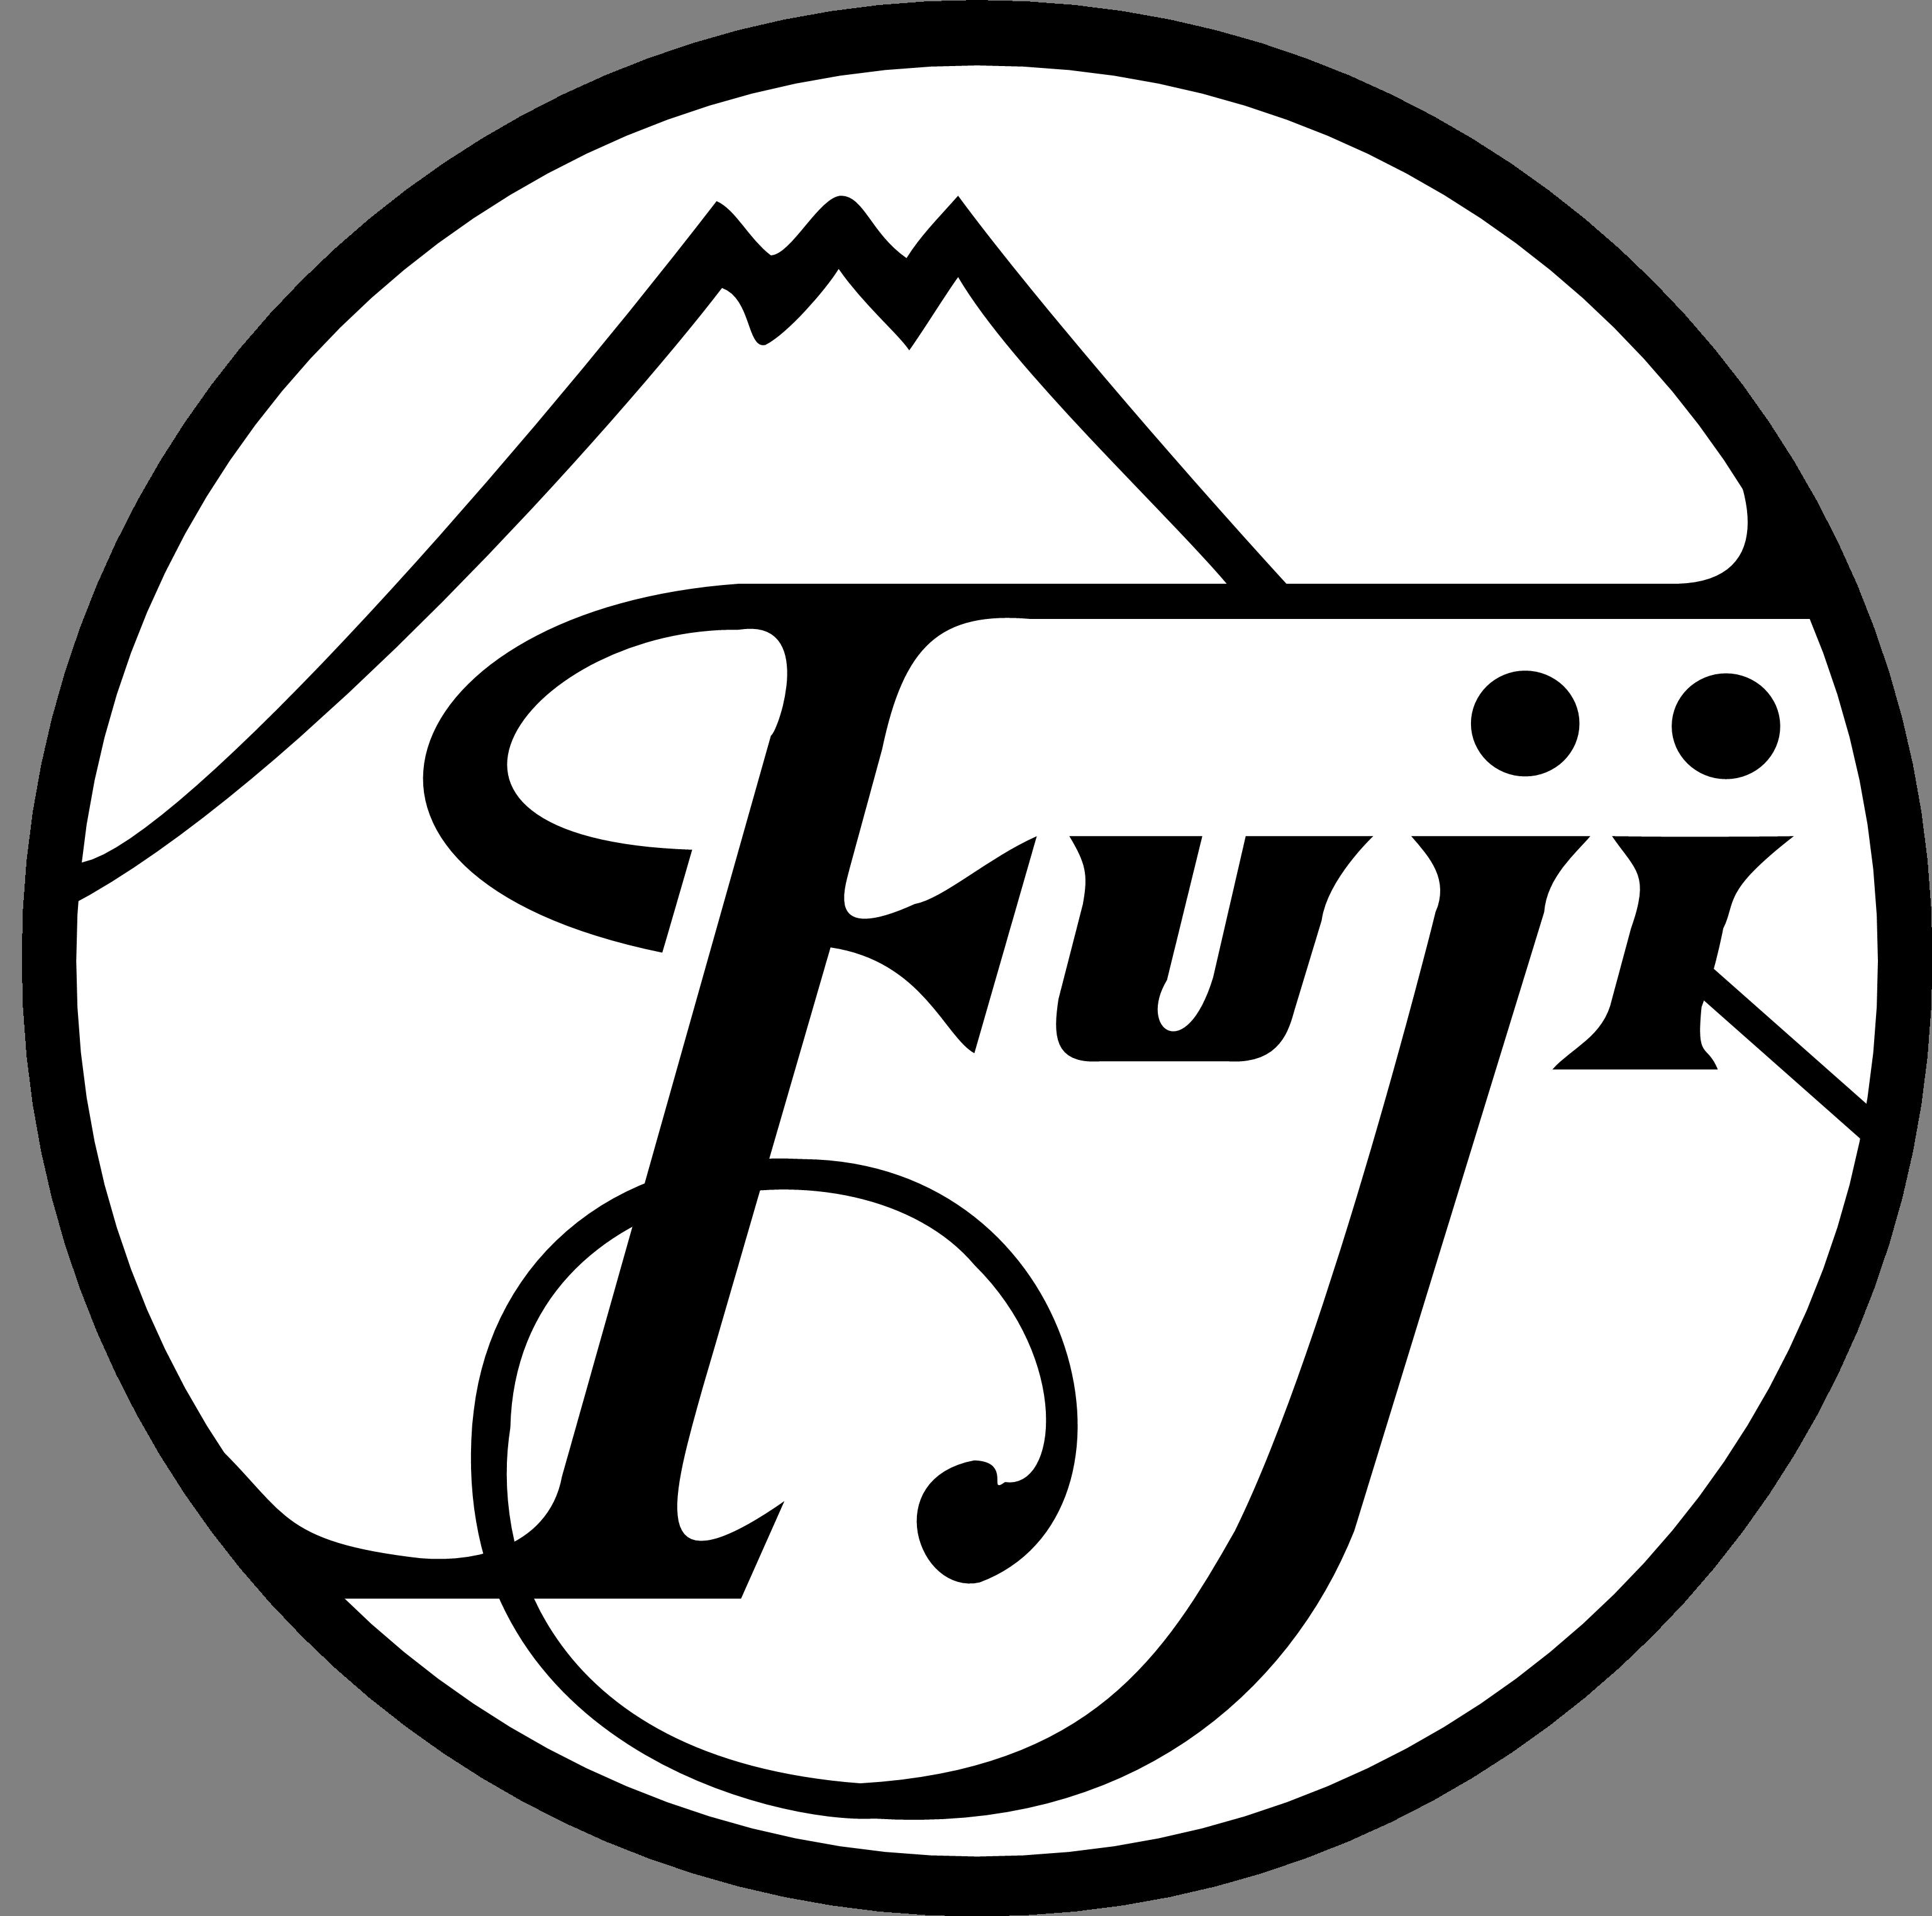 Fujifilm 1934 Png Vintage Logo Fujifilm Japanese Logo